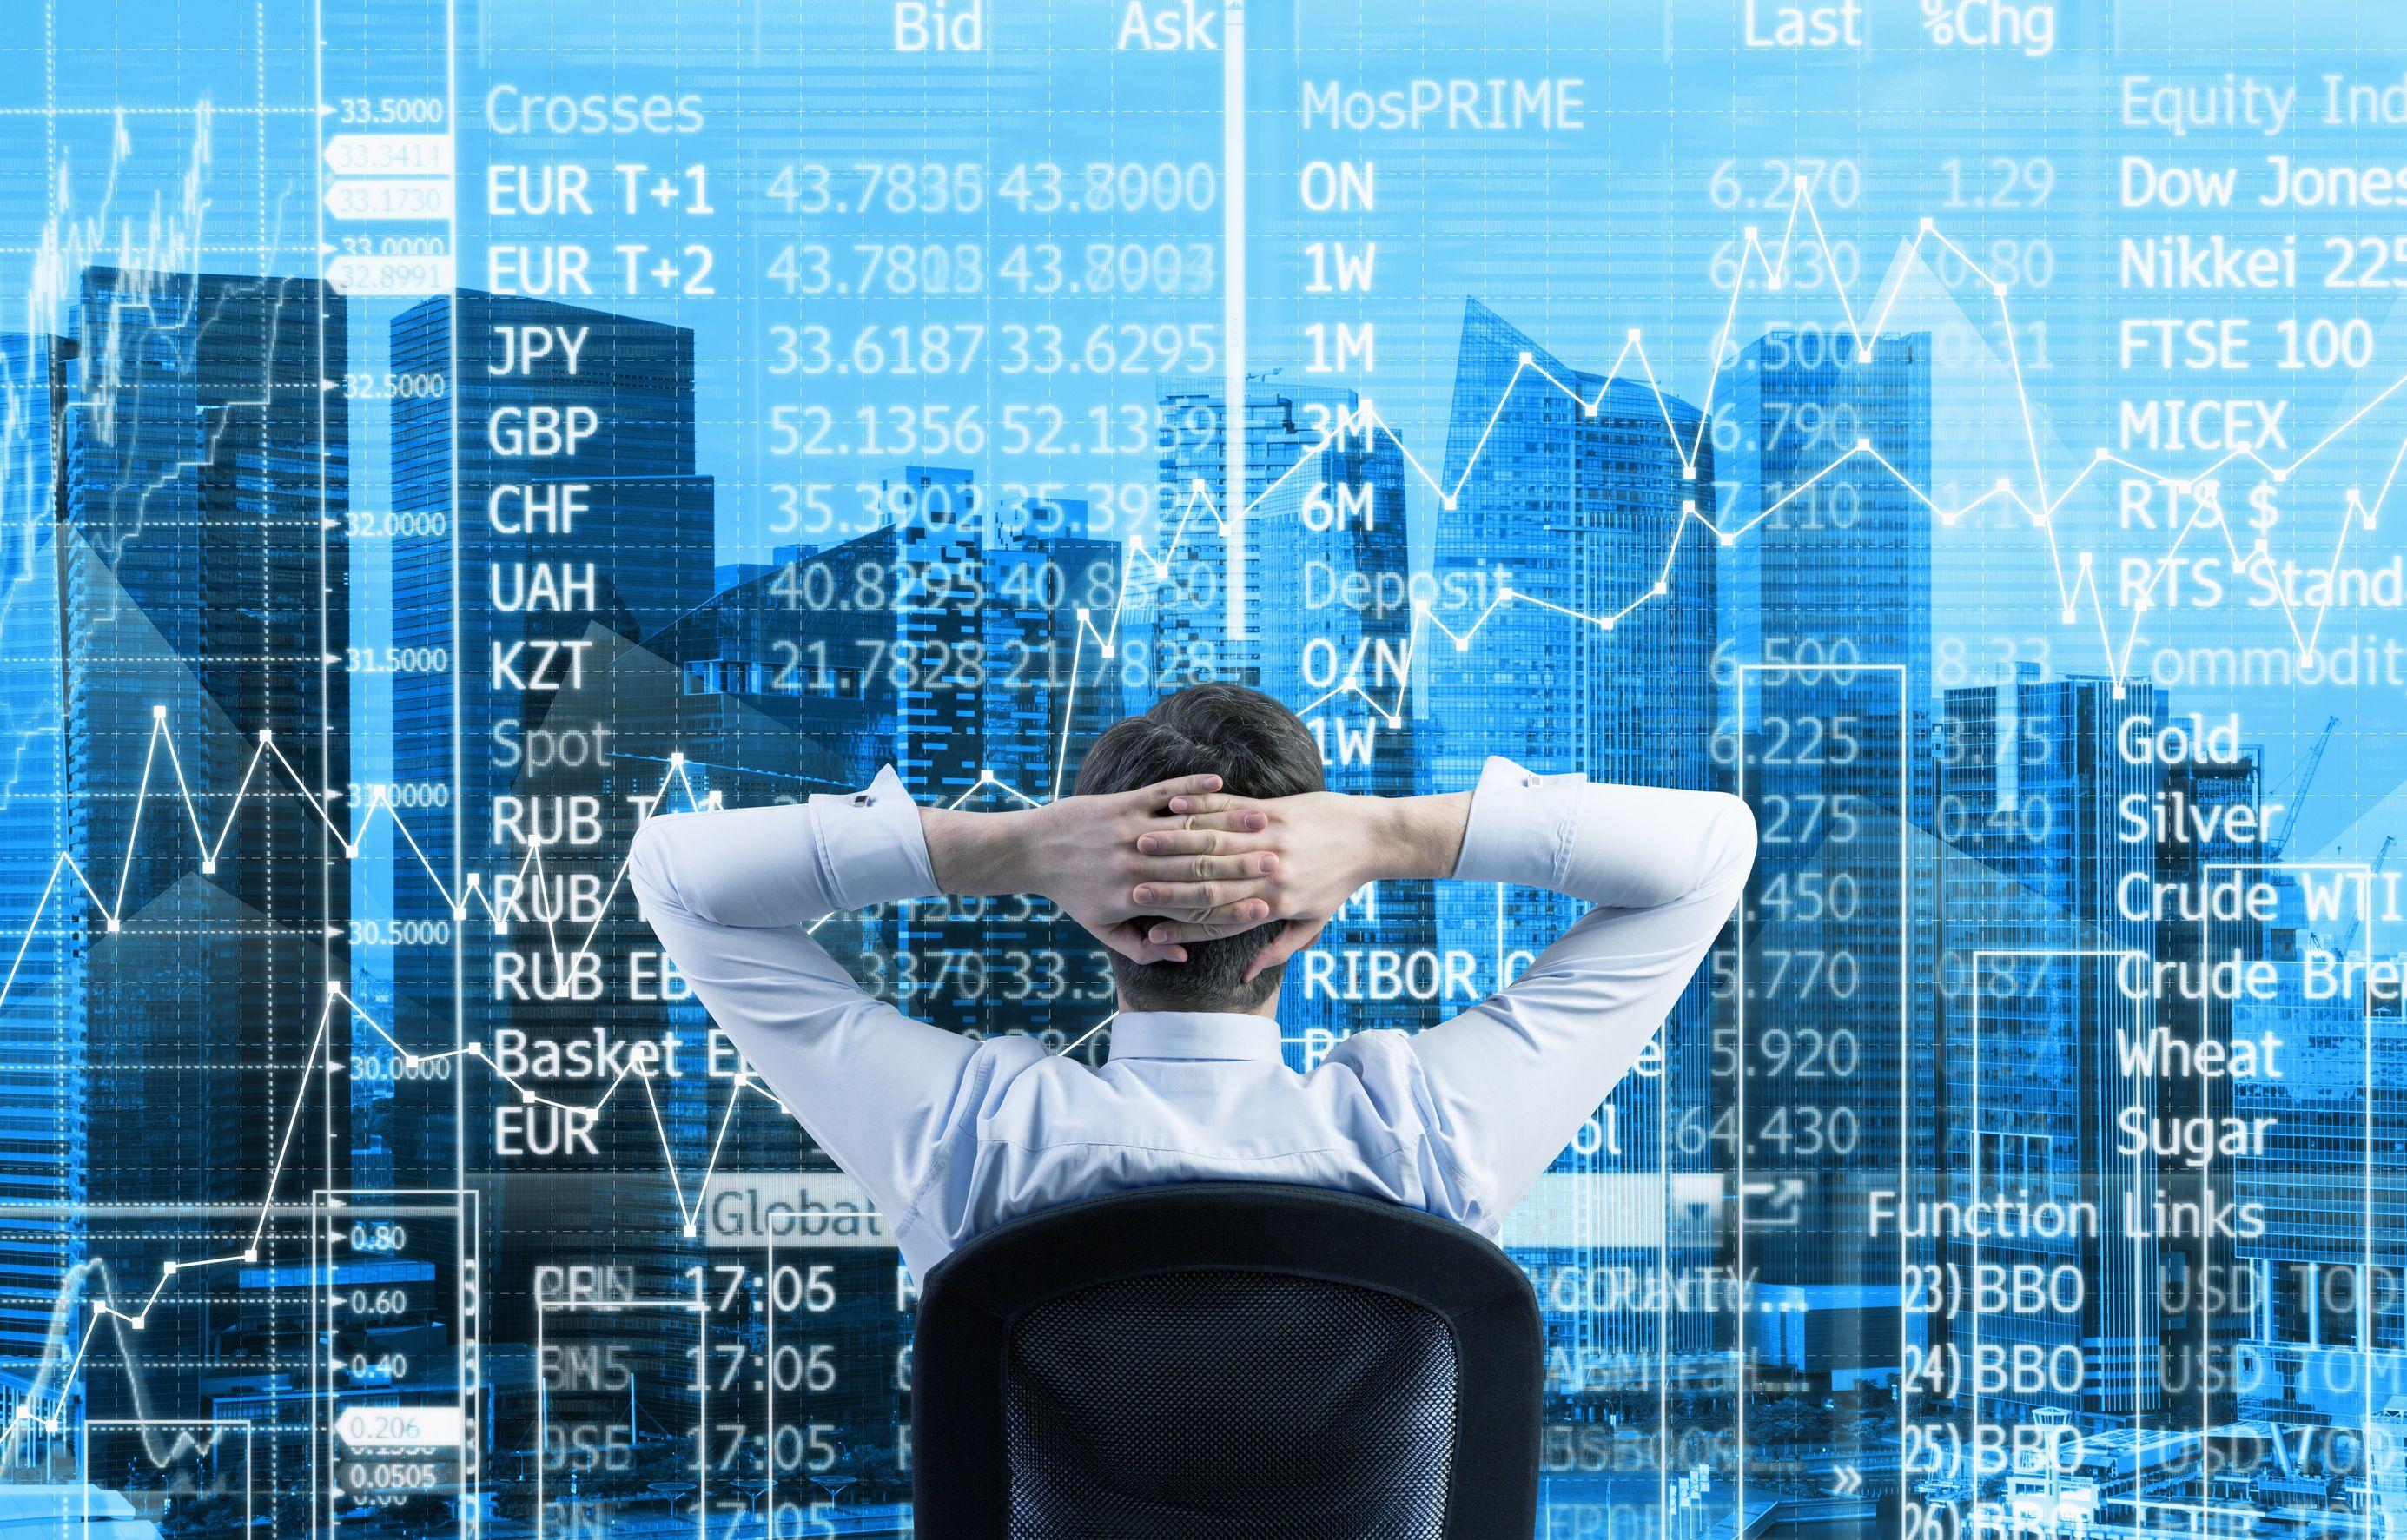 Accesso ai mercati globali | Interactive Brokers Luxembourg SARL